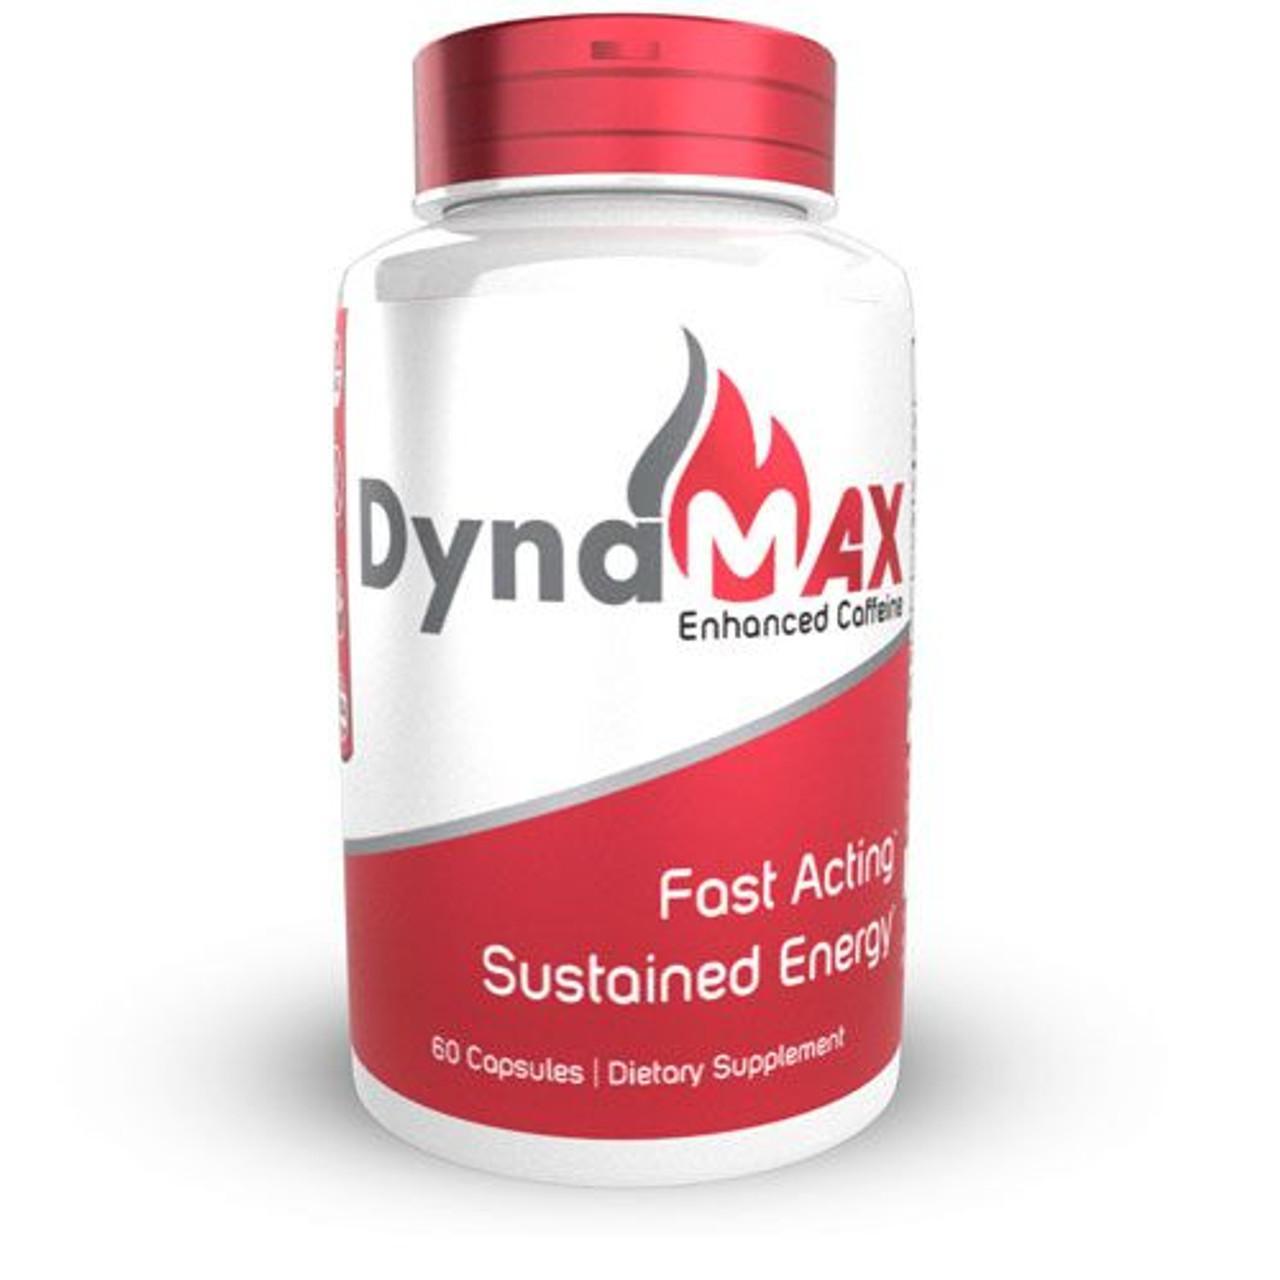 DynaMAX Enhanced Caffeine Capsules   Natural Energy Supplement